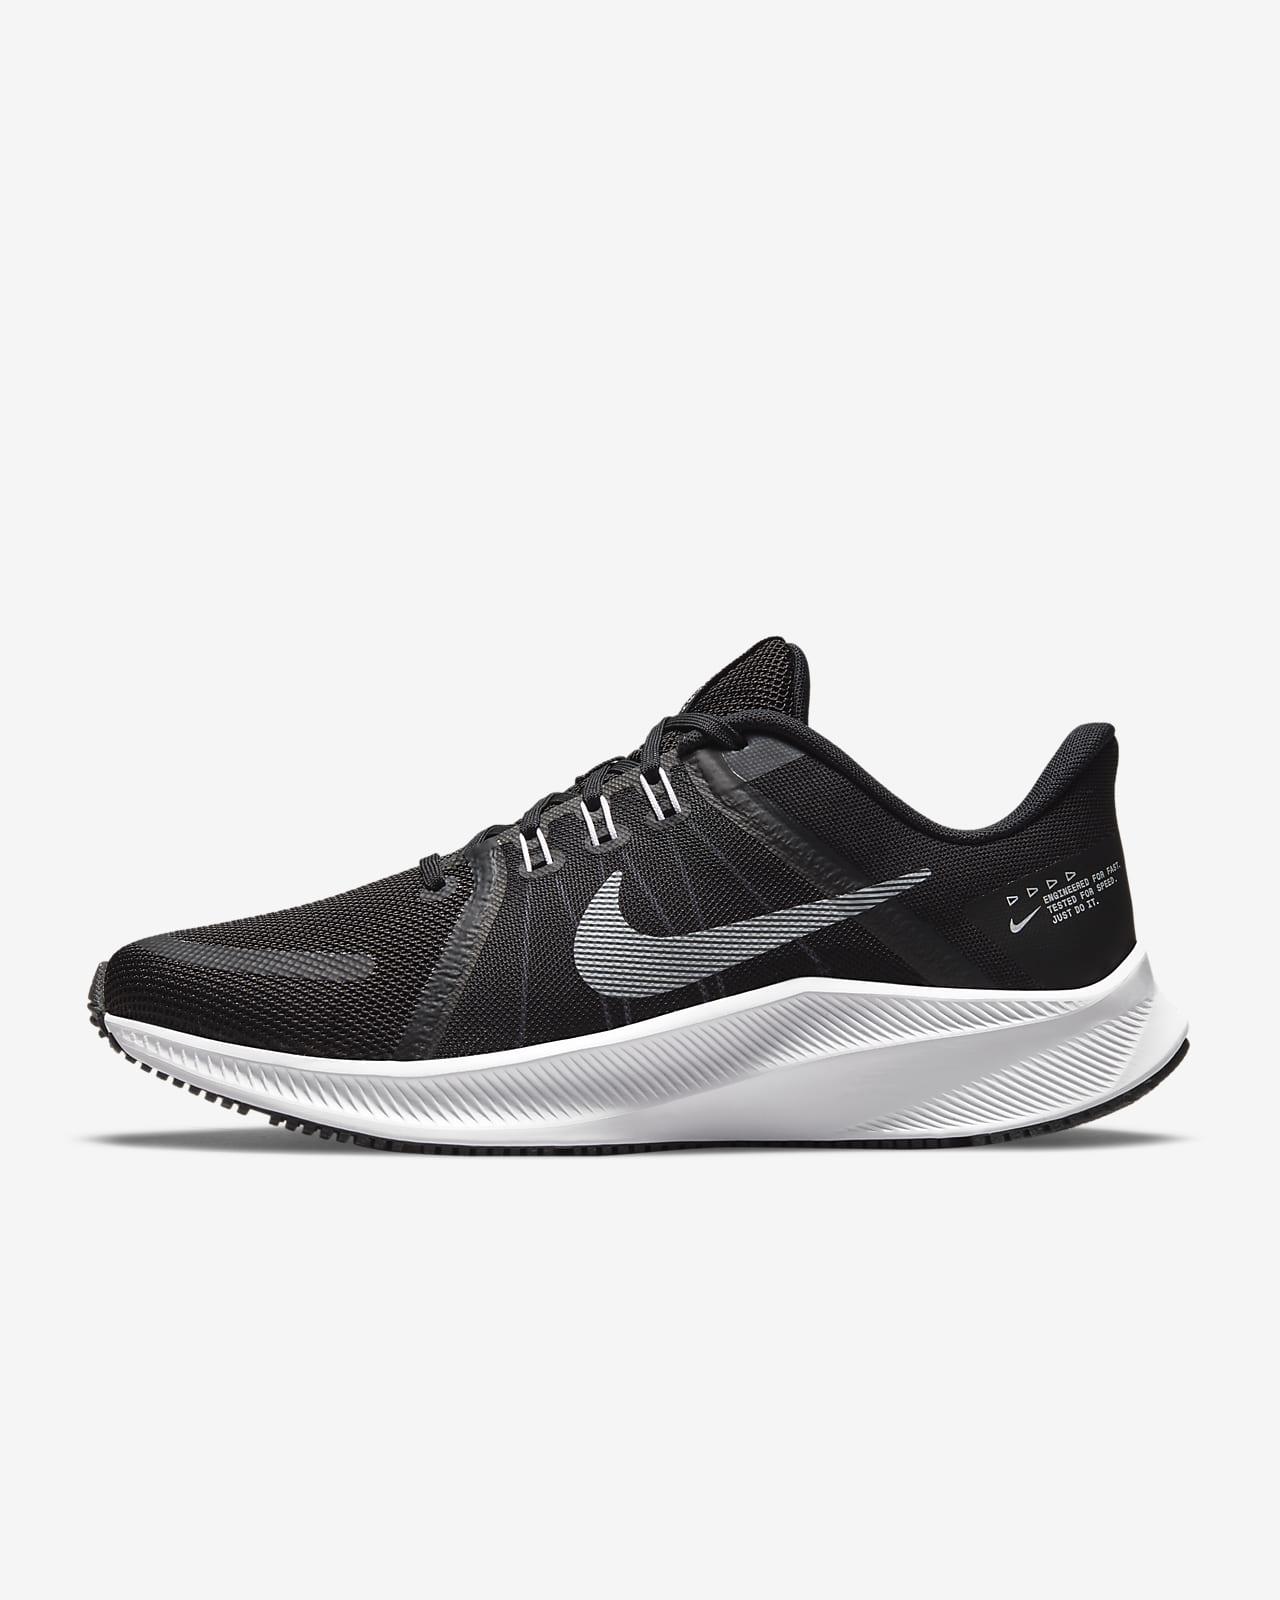 Calzado de running para carretera para mujer Nike Quest 4